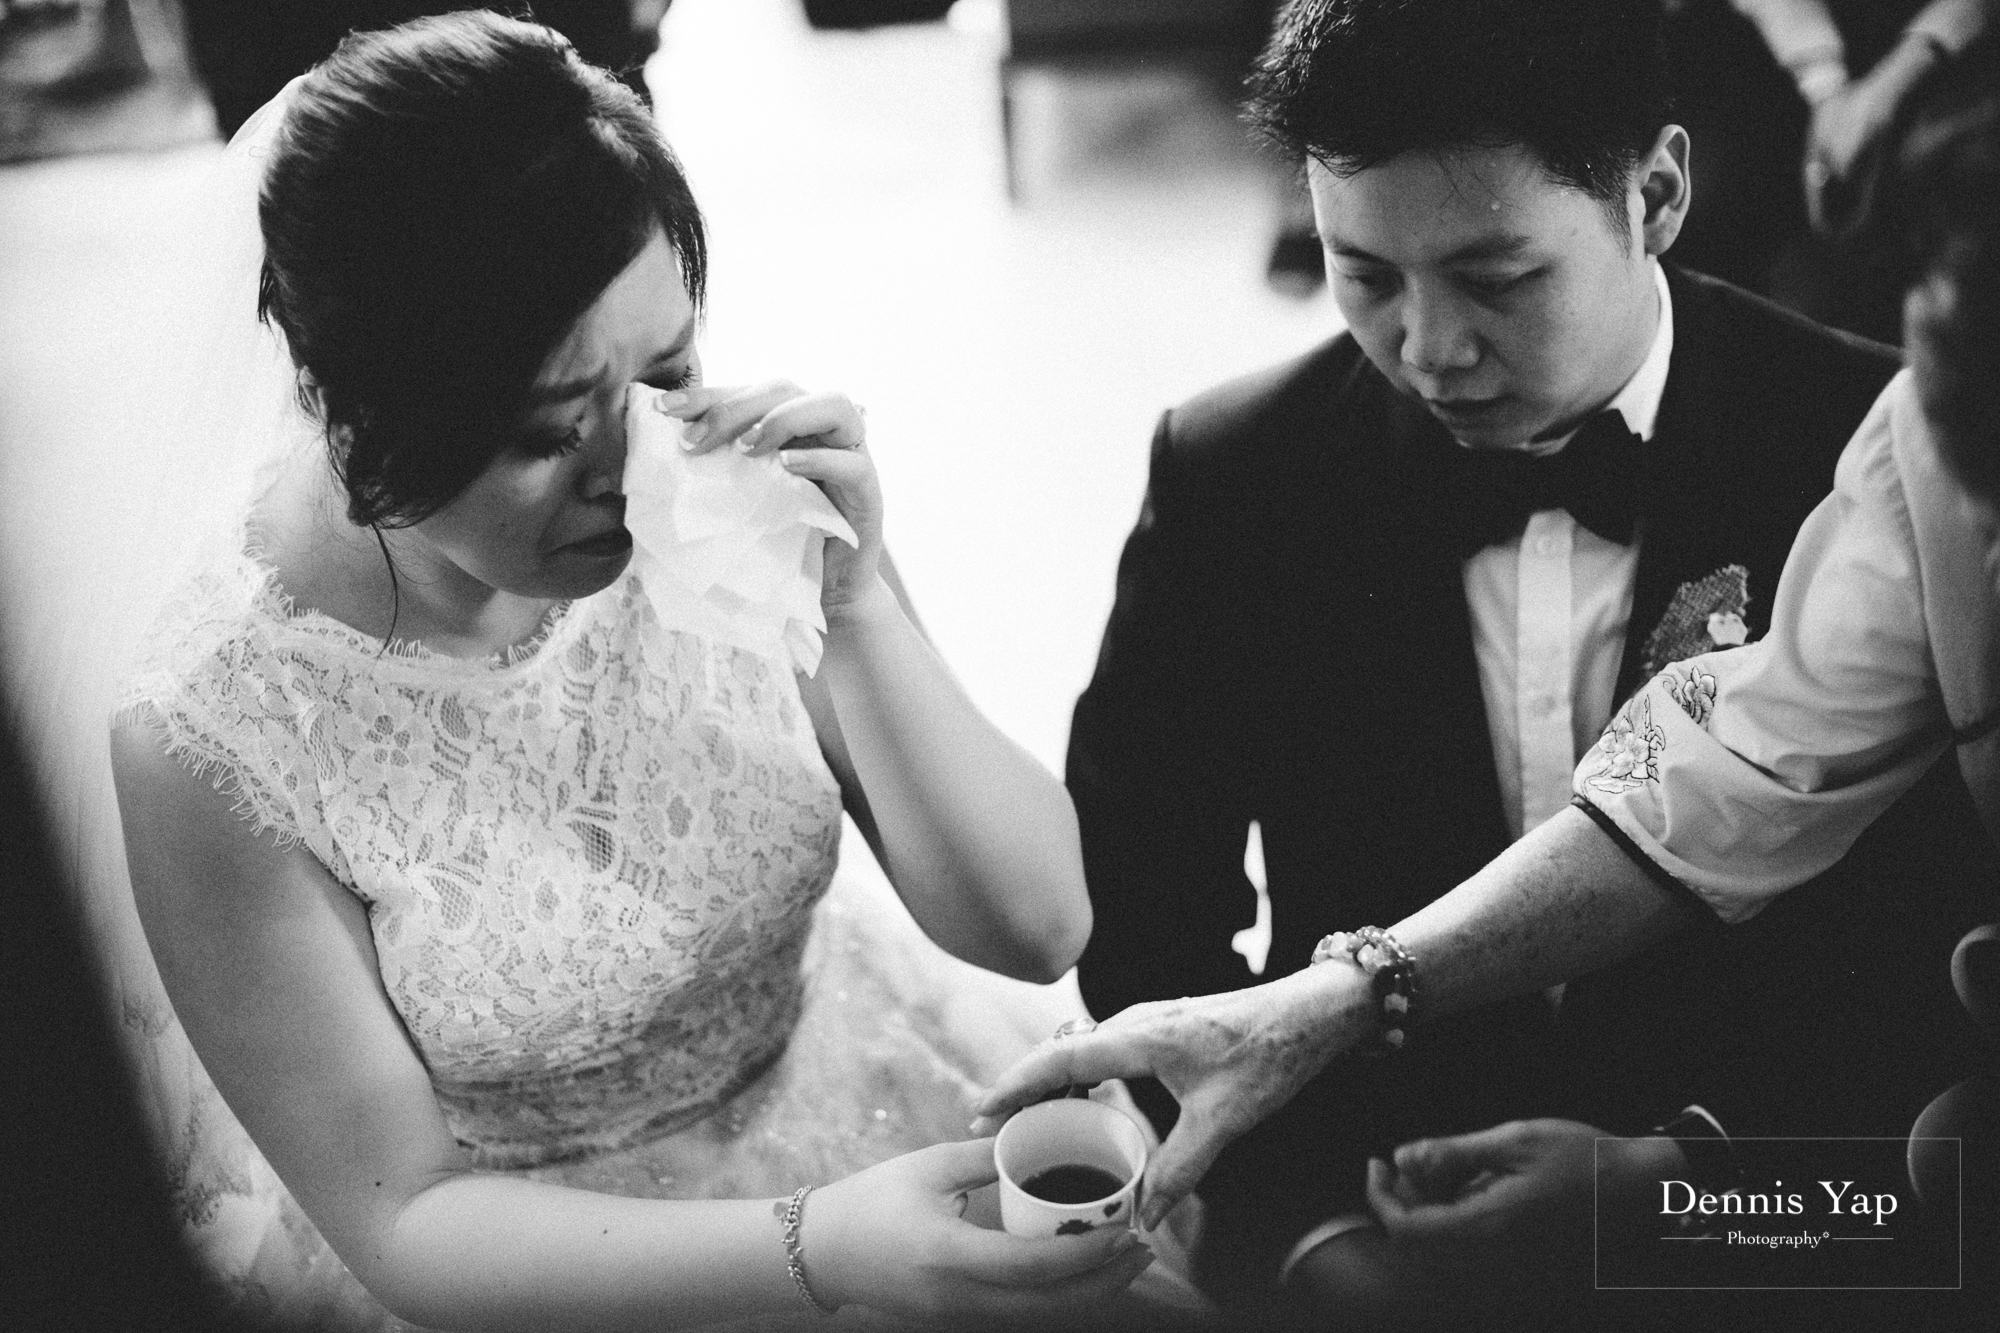 ino sheri black white church wedding st thomas more subang jaya dennis yap photography touching love beloved australia indonesia-12.jpg